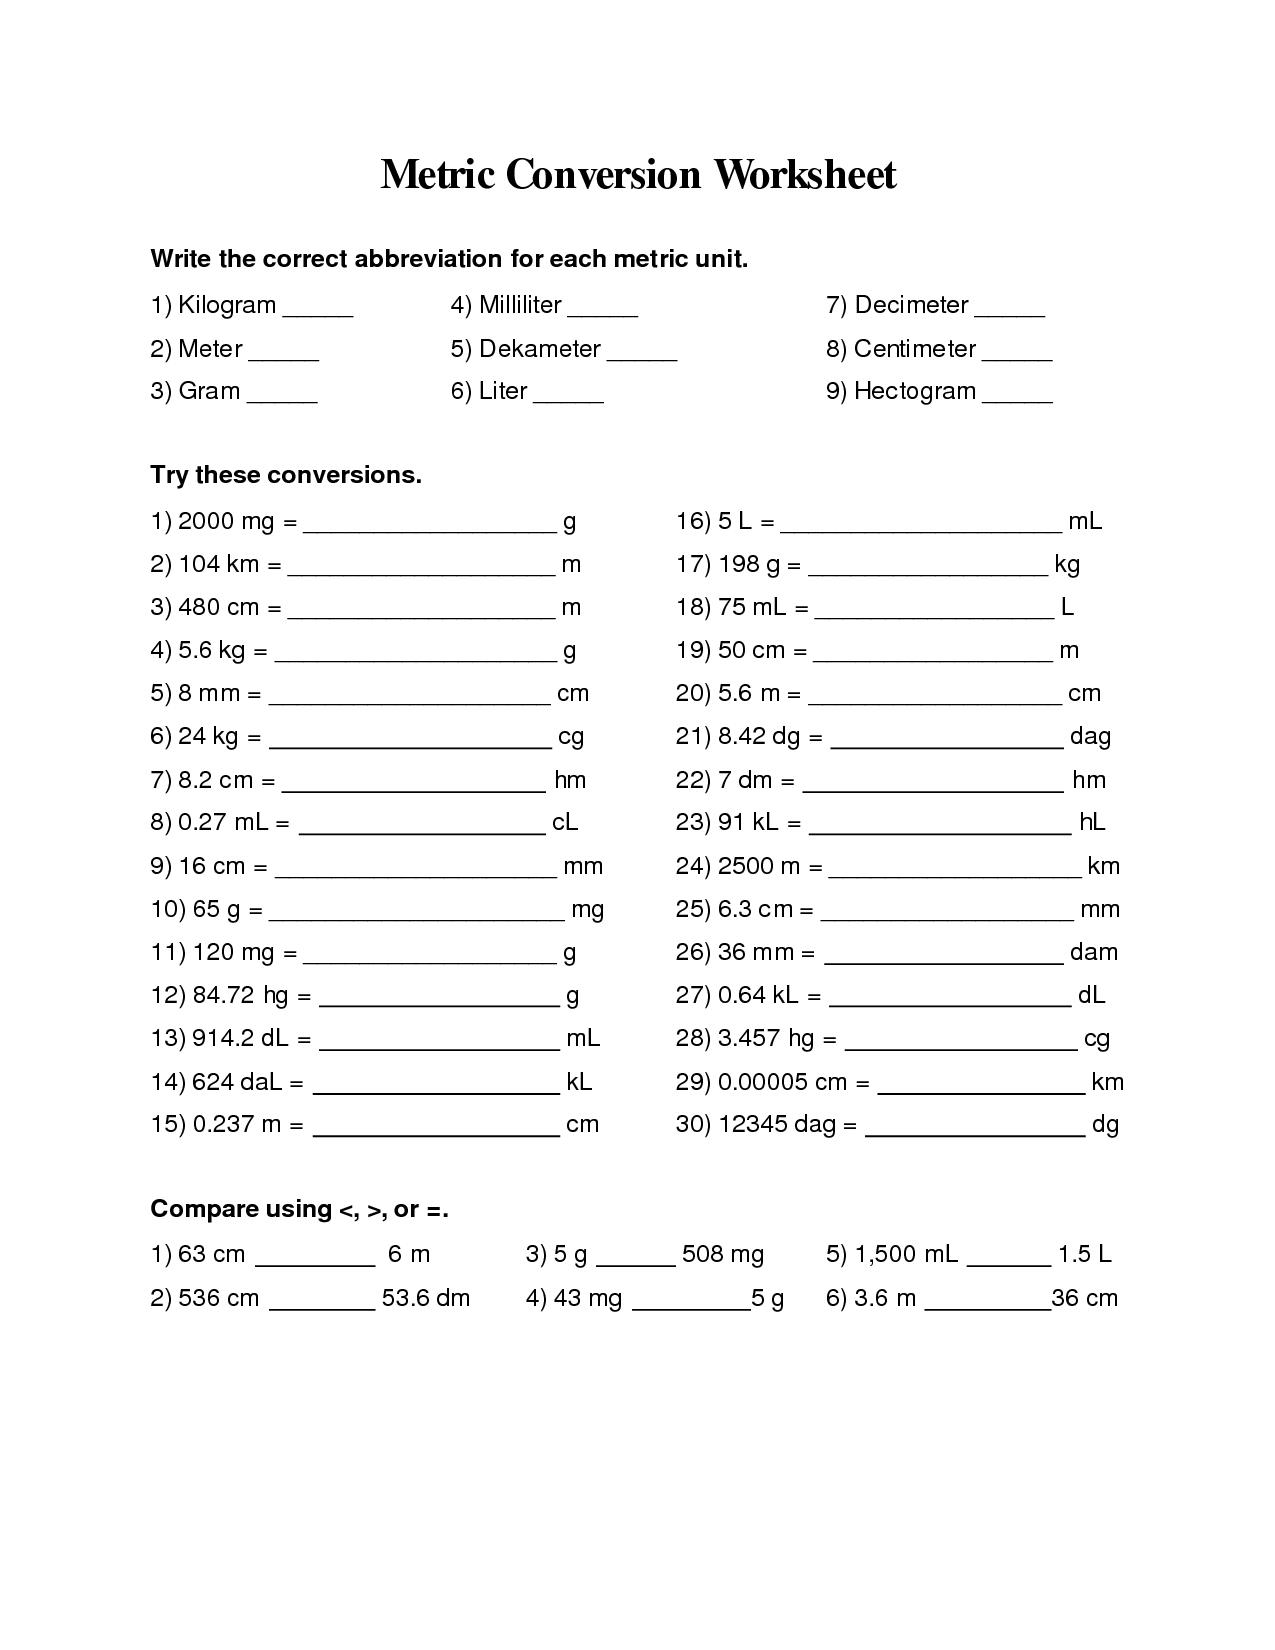 Metric Conversion Worksheets 6th Grade Metric Conversion Worksheet